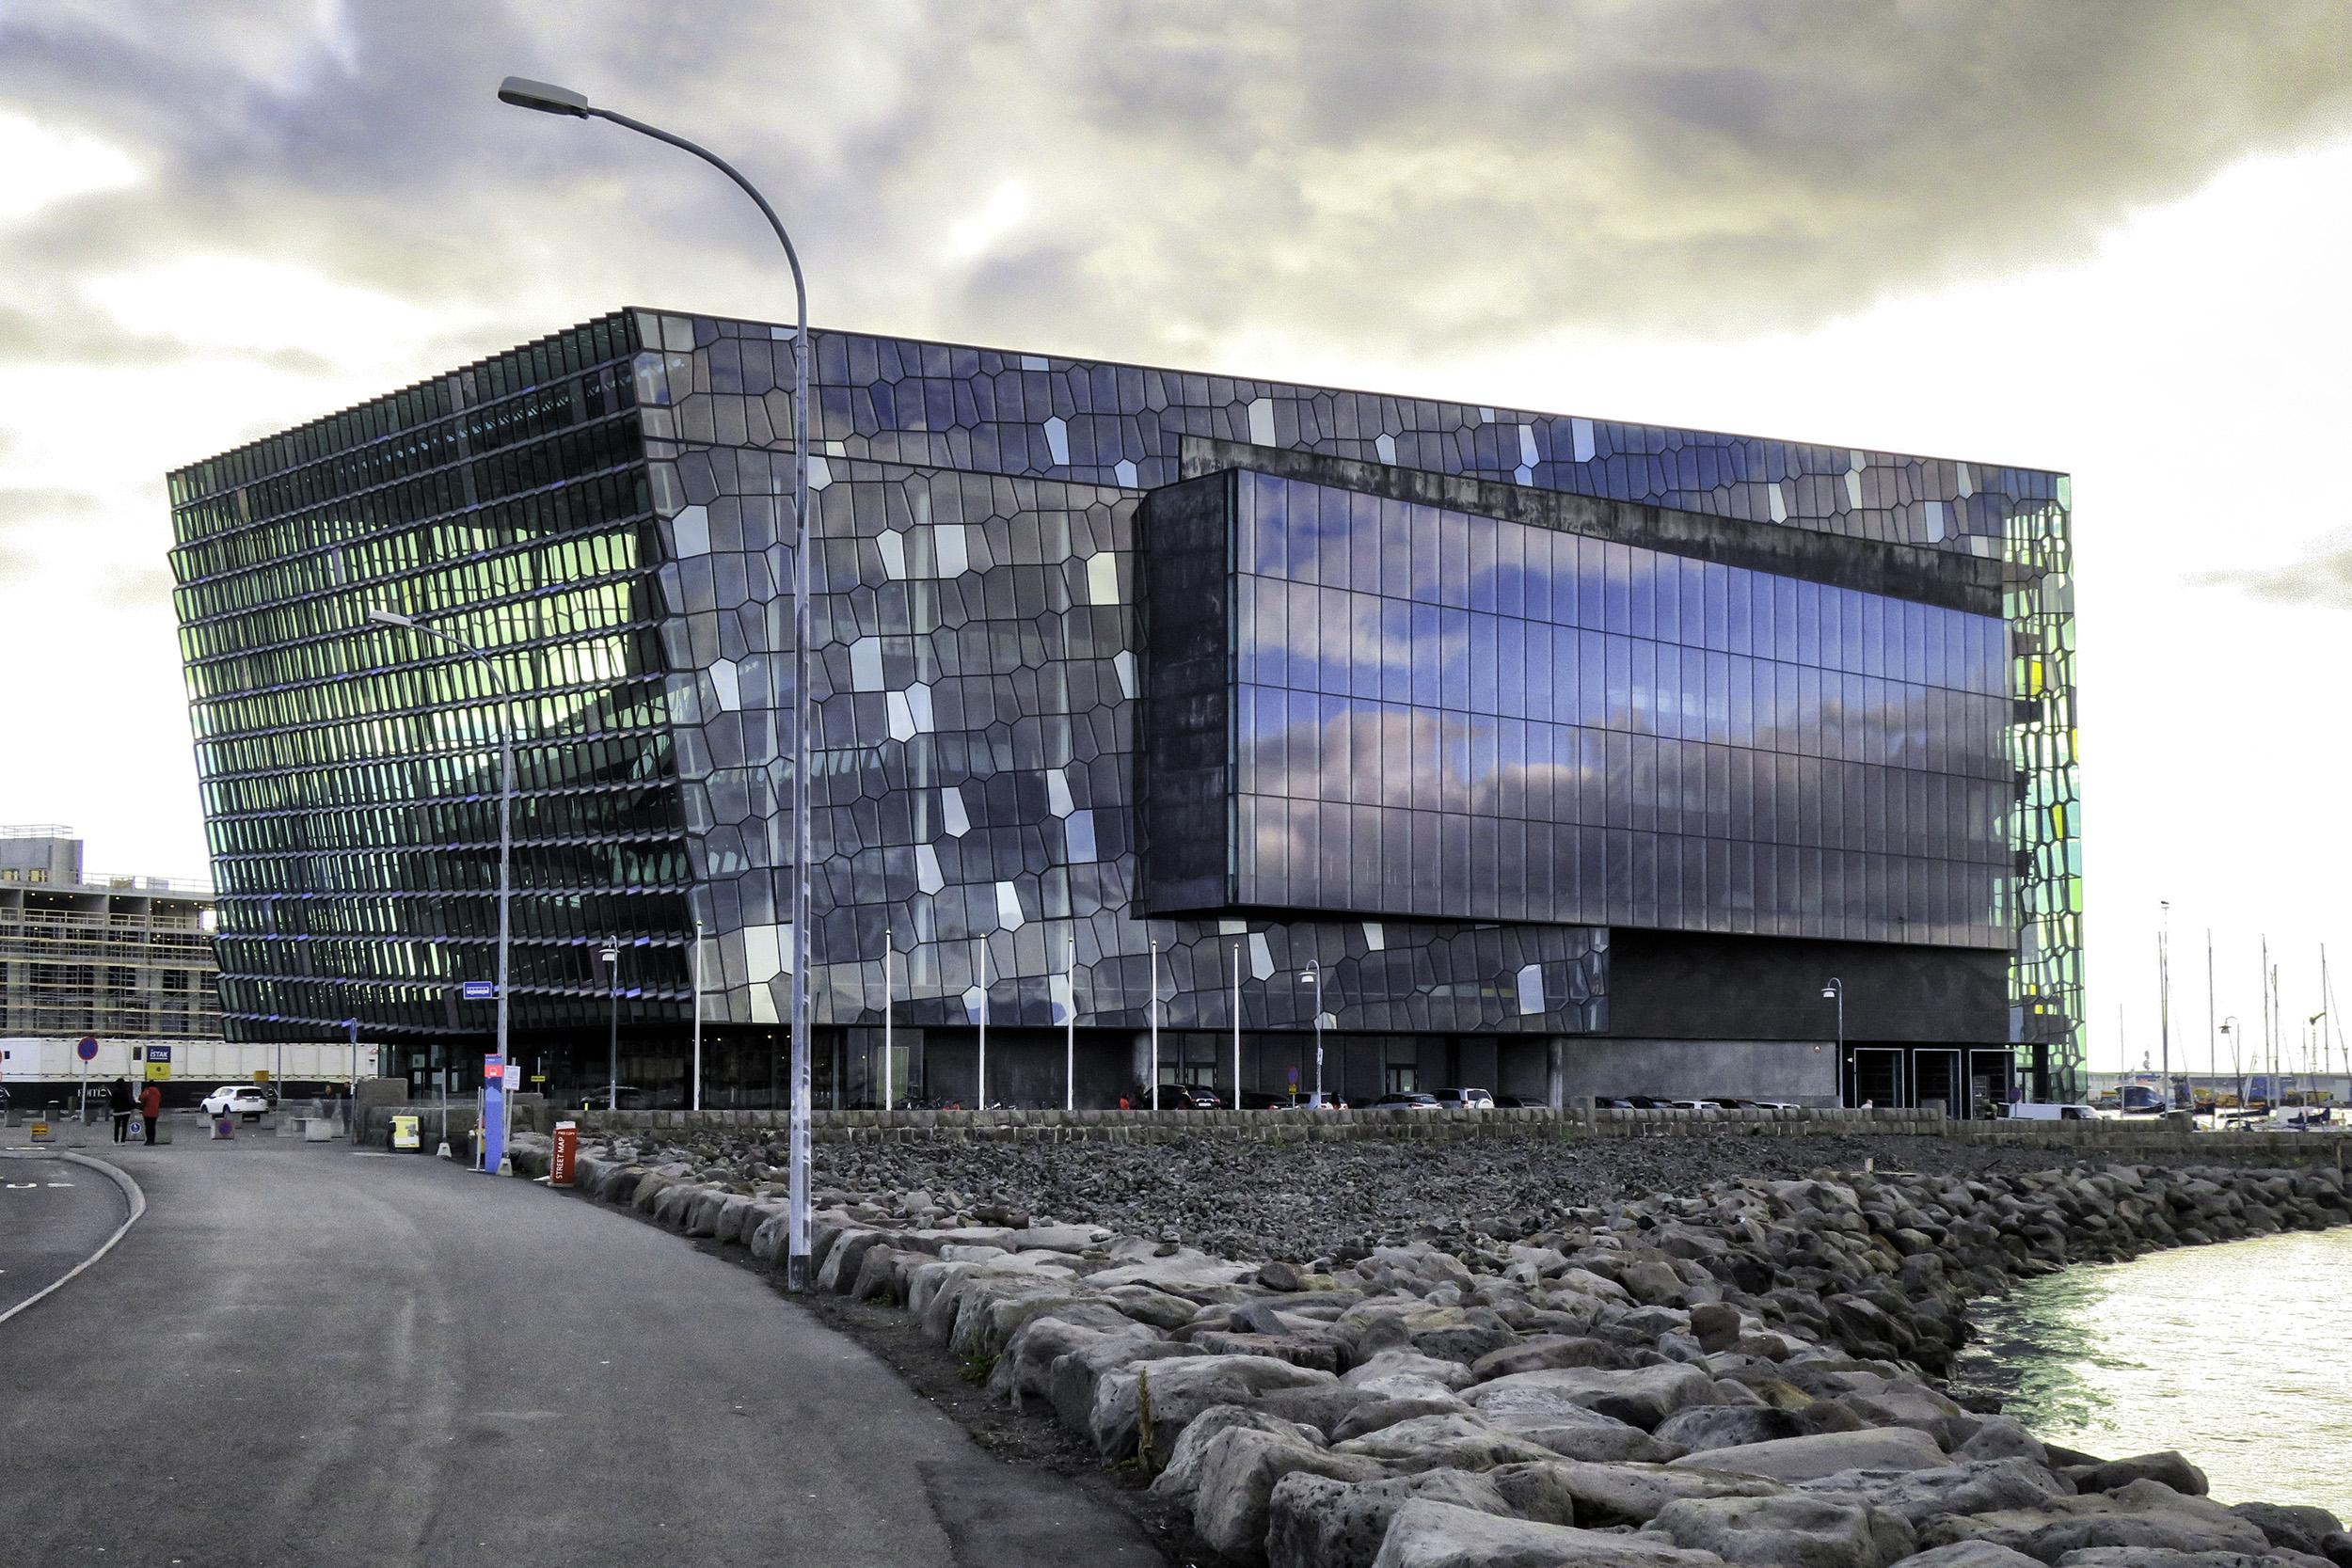 The Harpa, Reykjavik